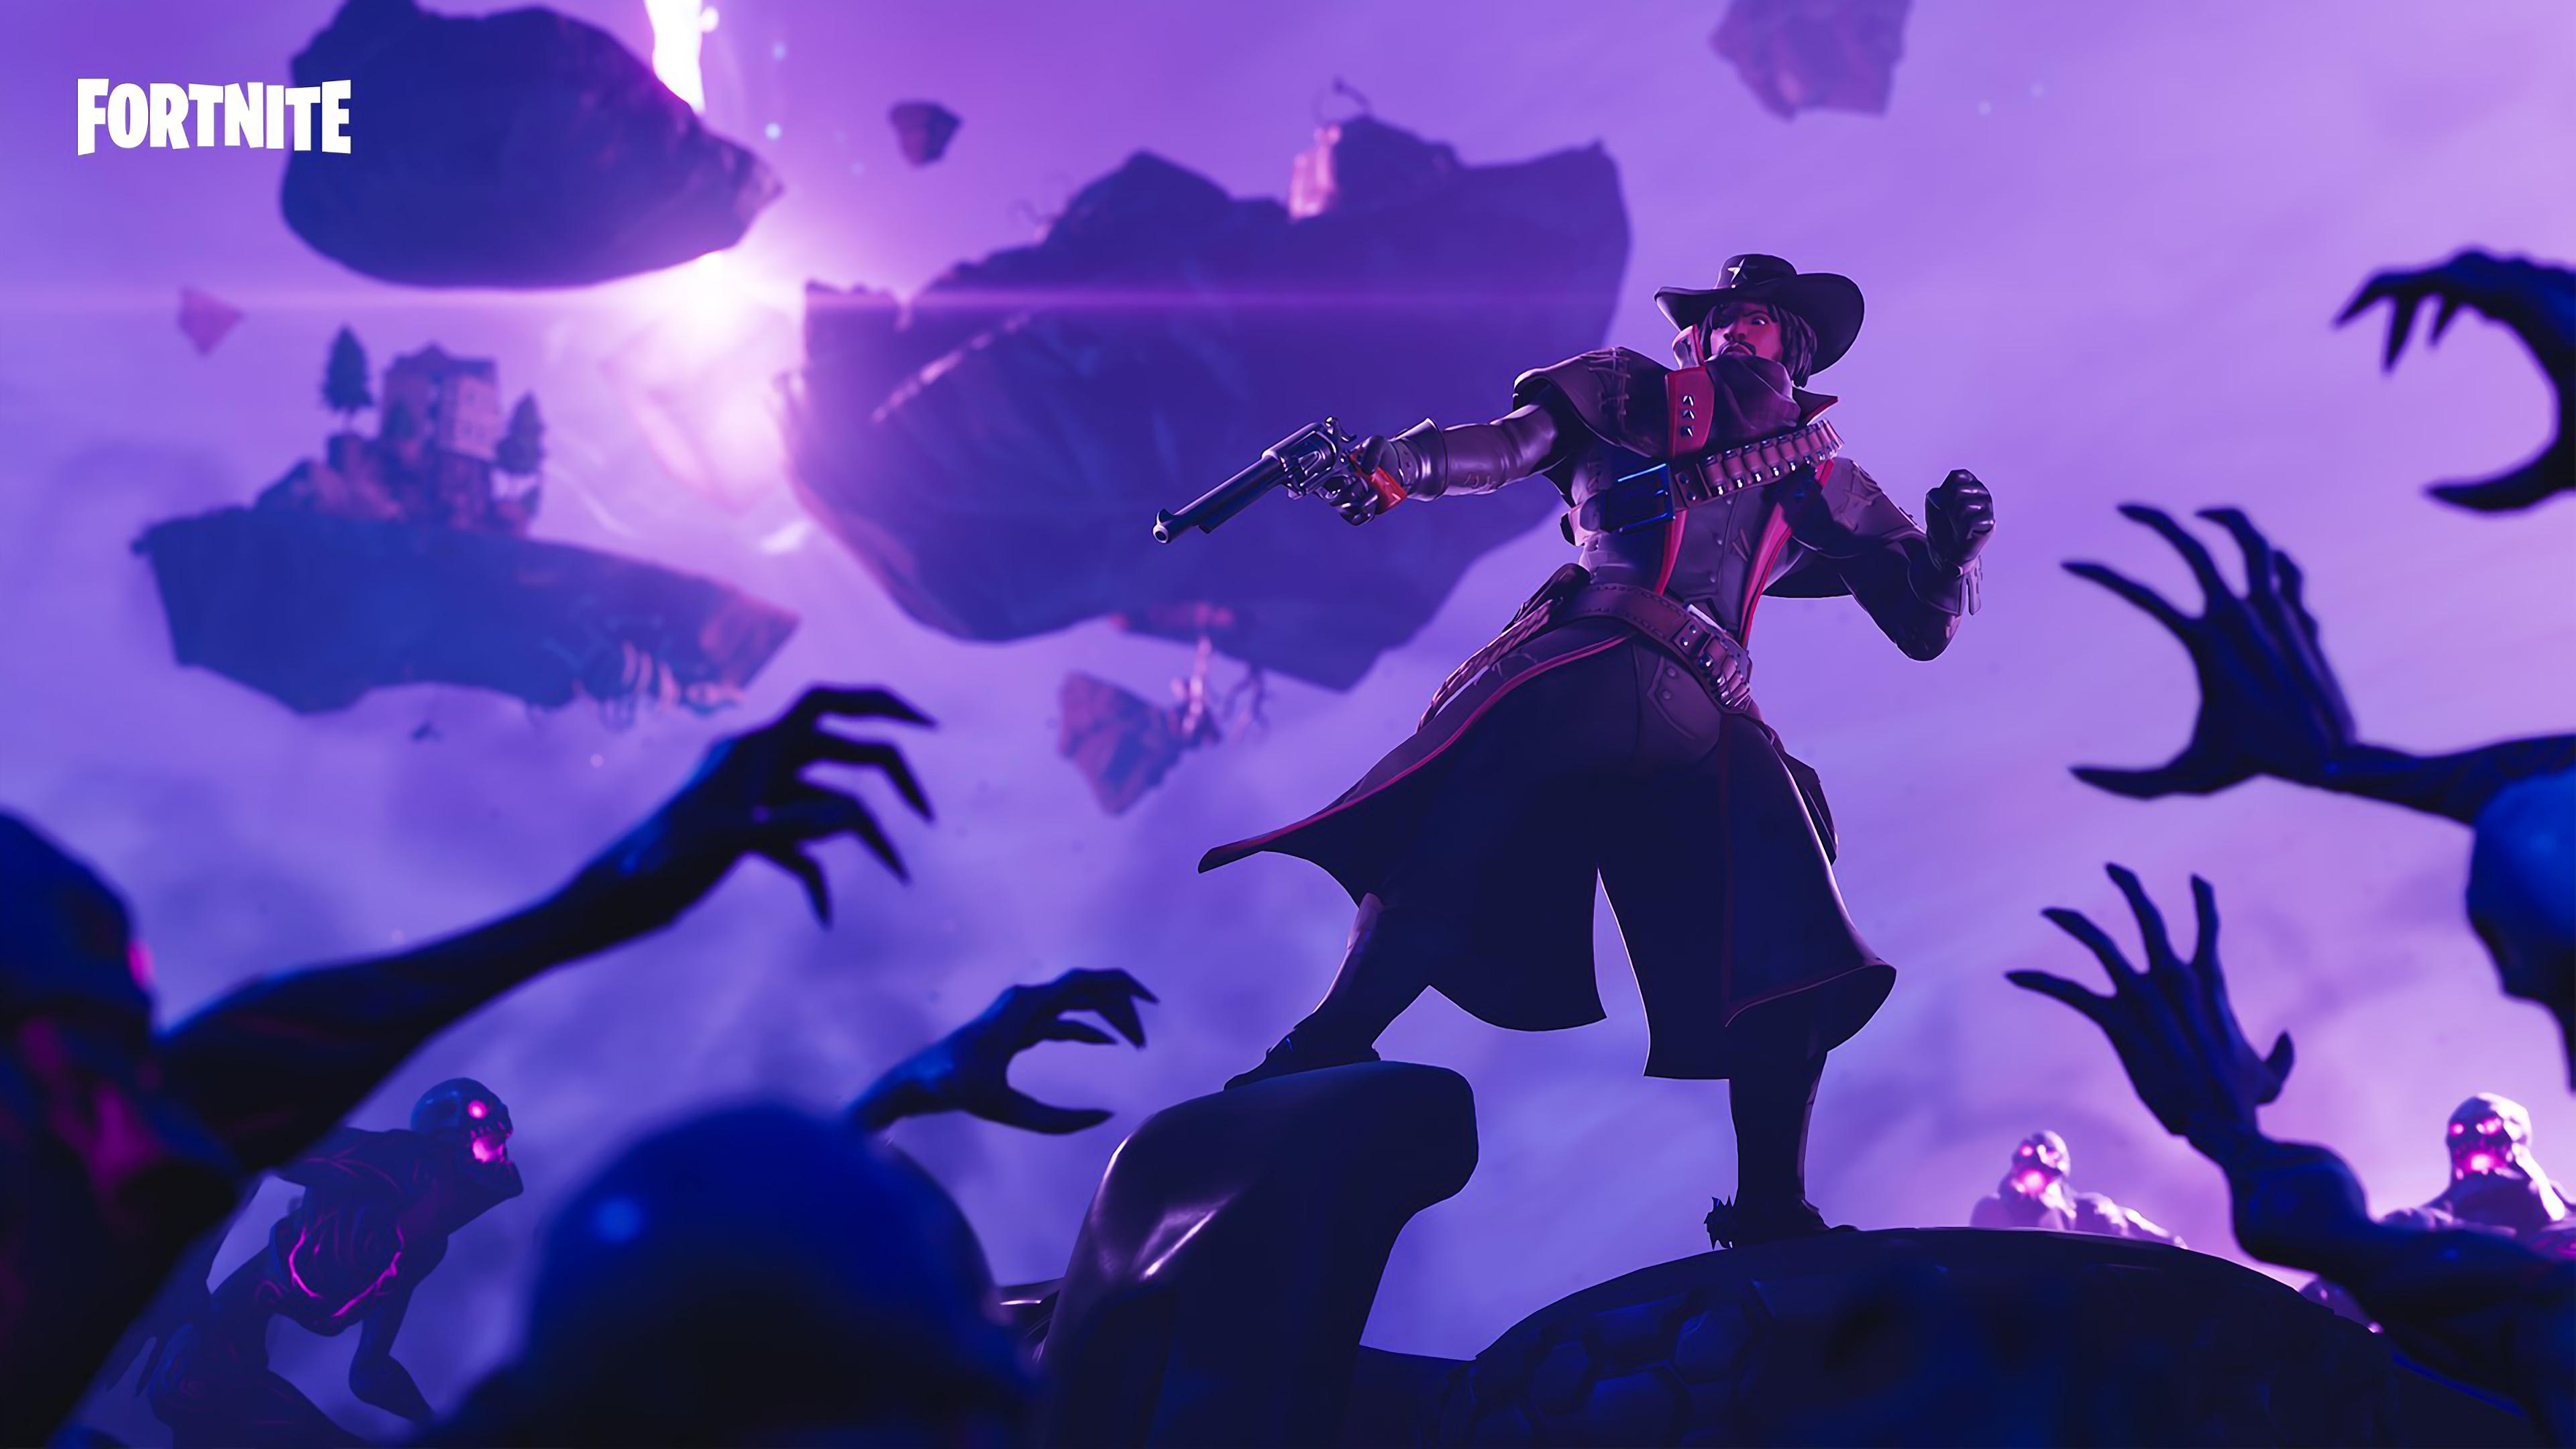 Deadfire Fortnite Battle Royale Hd Games 4k Wallpapers Images